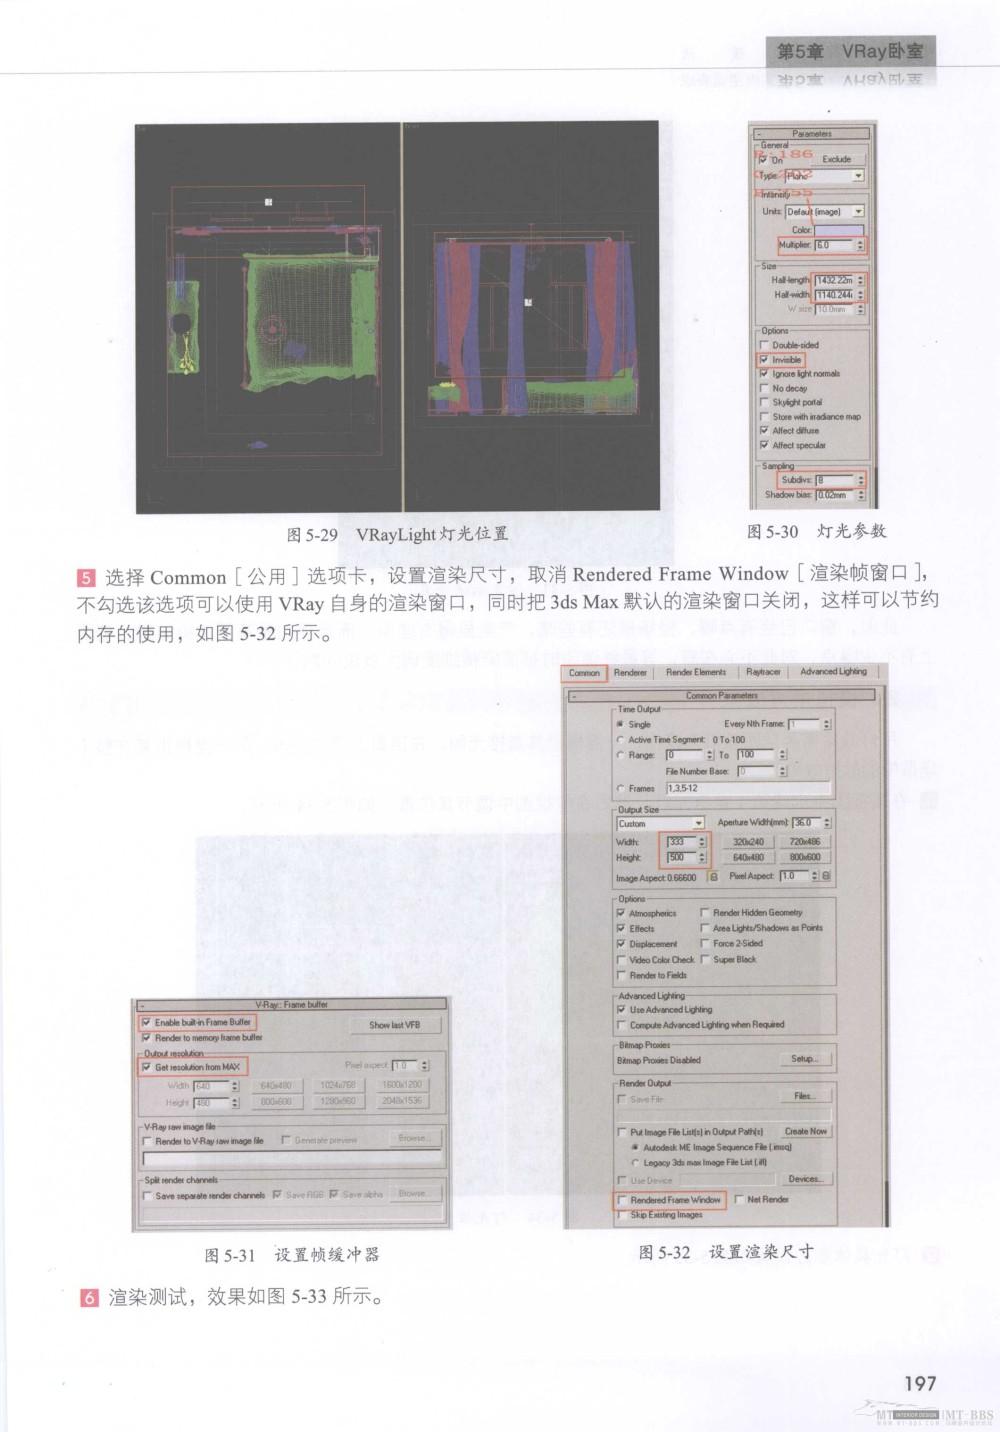 水晶石技法-3ds_Max&VRay室内空间表现_水晶石技法-3ds_Max&VRay室内空间表现_页面_203.jpg